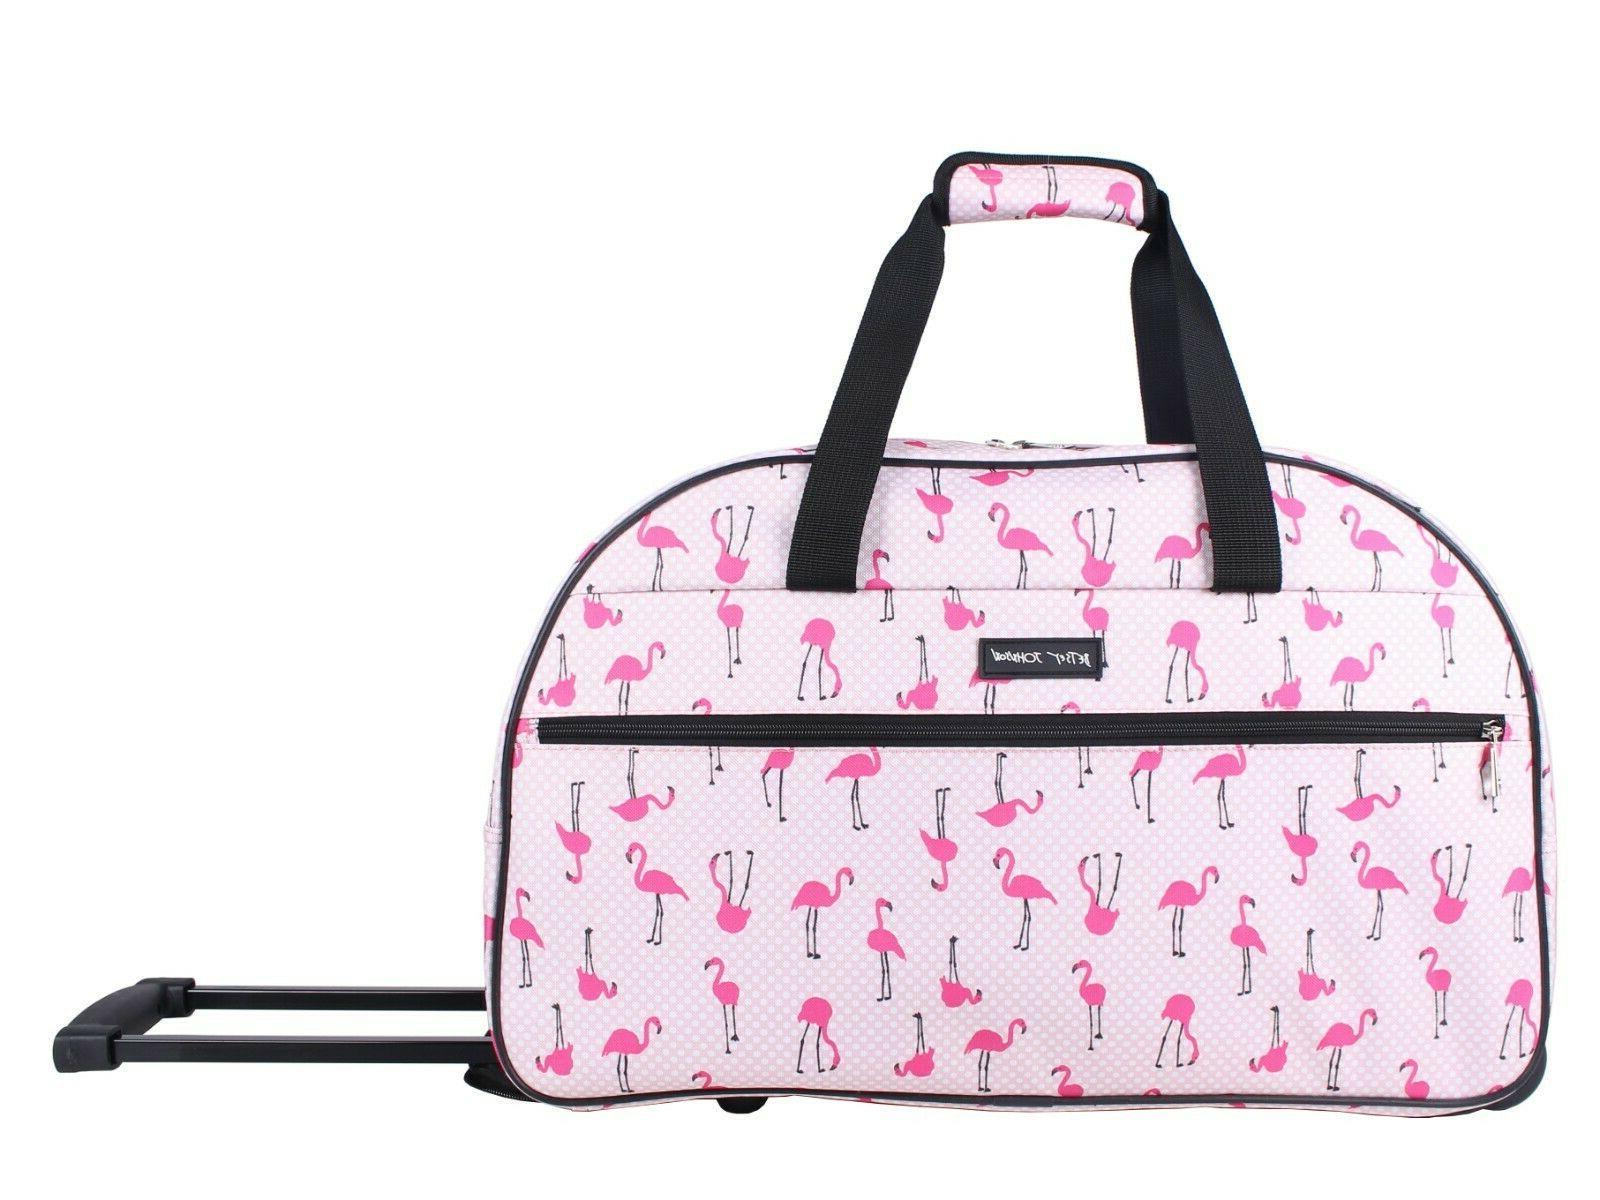 22 inch designer carry on luggage satchel